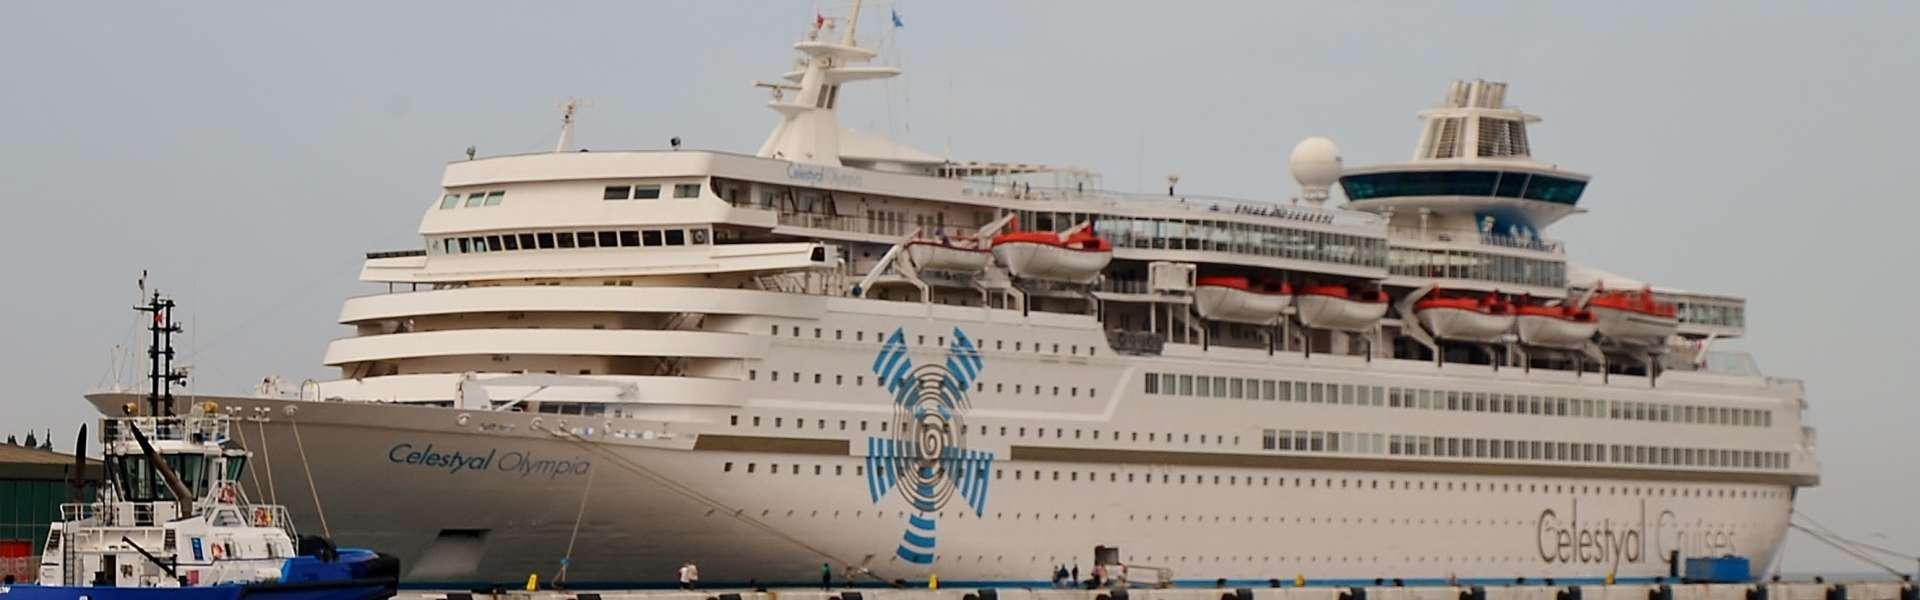 Croaziera 2019 - Insulele Grecesti (Atena/Piraeus) - Celestyal Cruises - Celestyal Olympia - 3 nopti